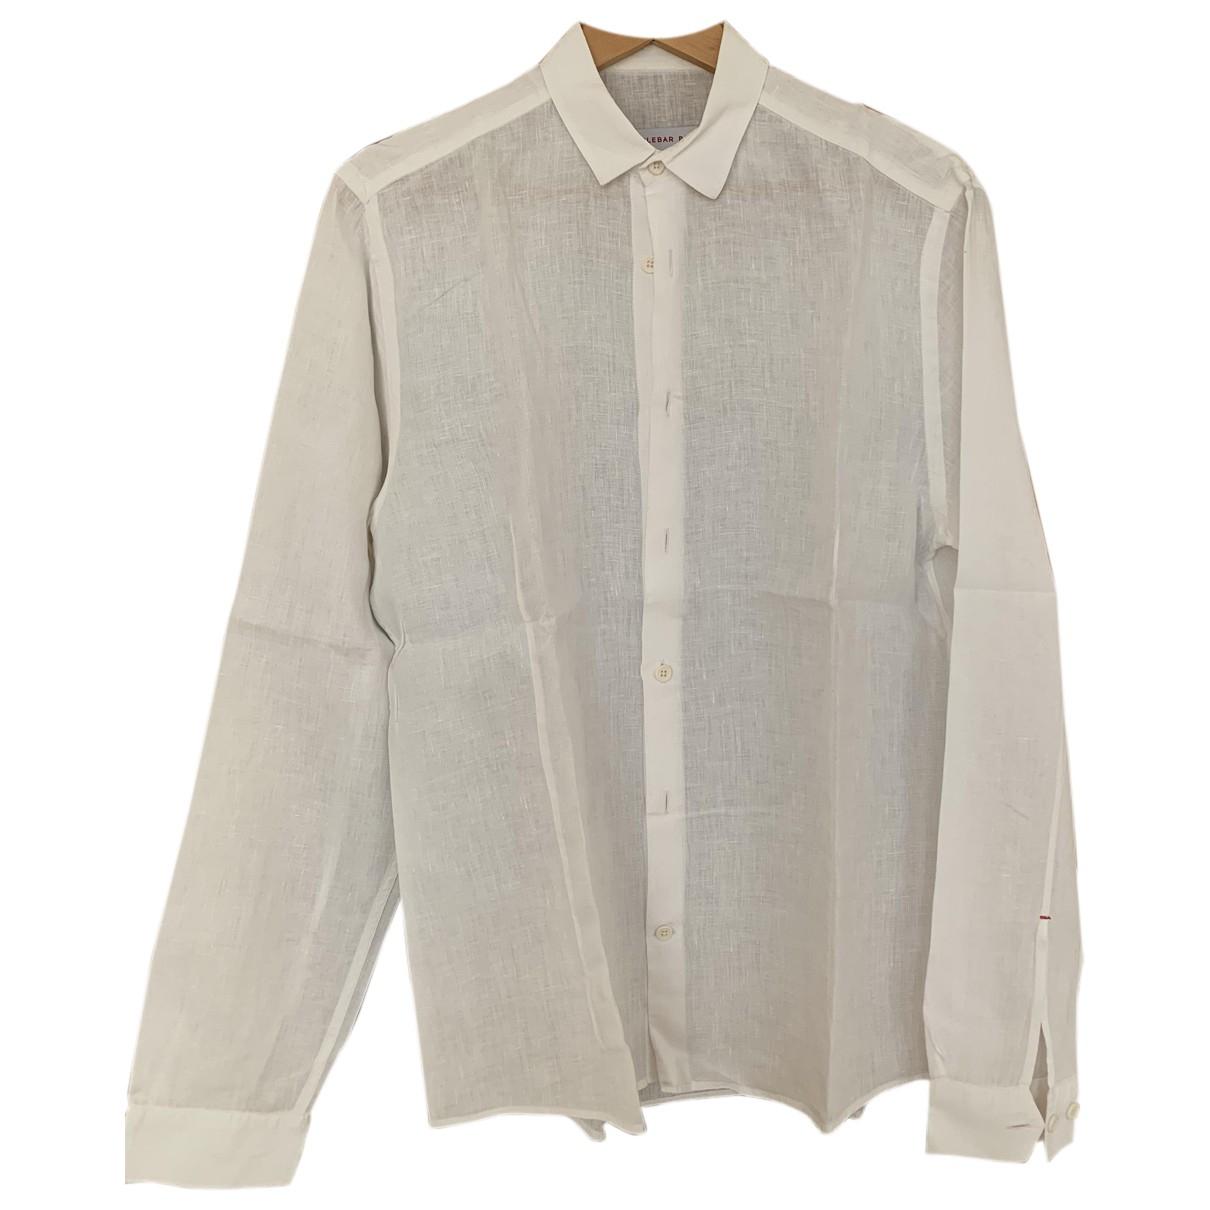 Orlebar Brown - Chemises   pour homme en lin - blanc